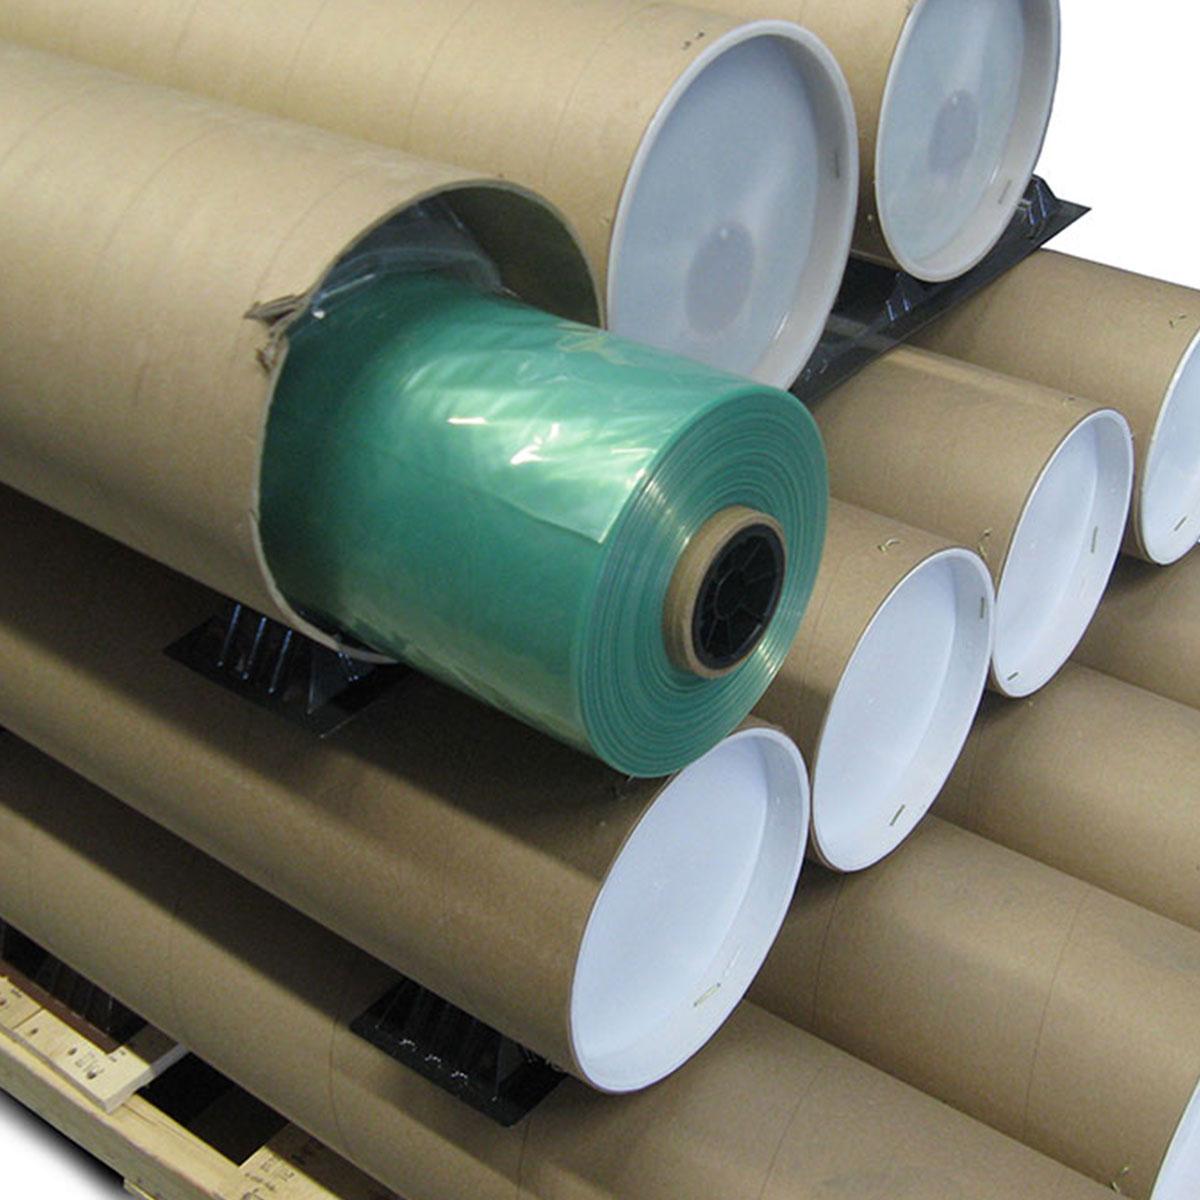 vakuum sack nylon 1200 grn lft 0076mm x 1200mm 528m 0003 x 48